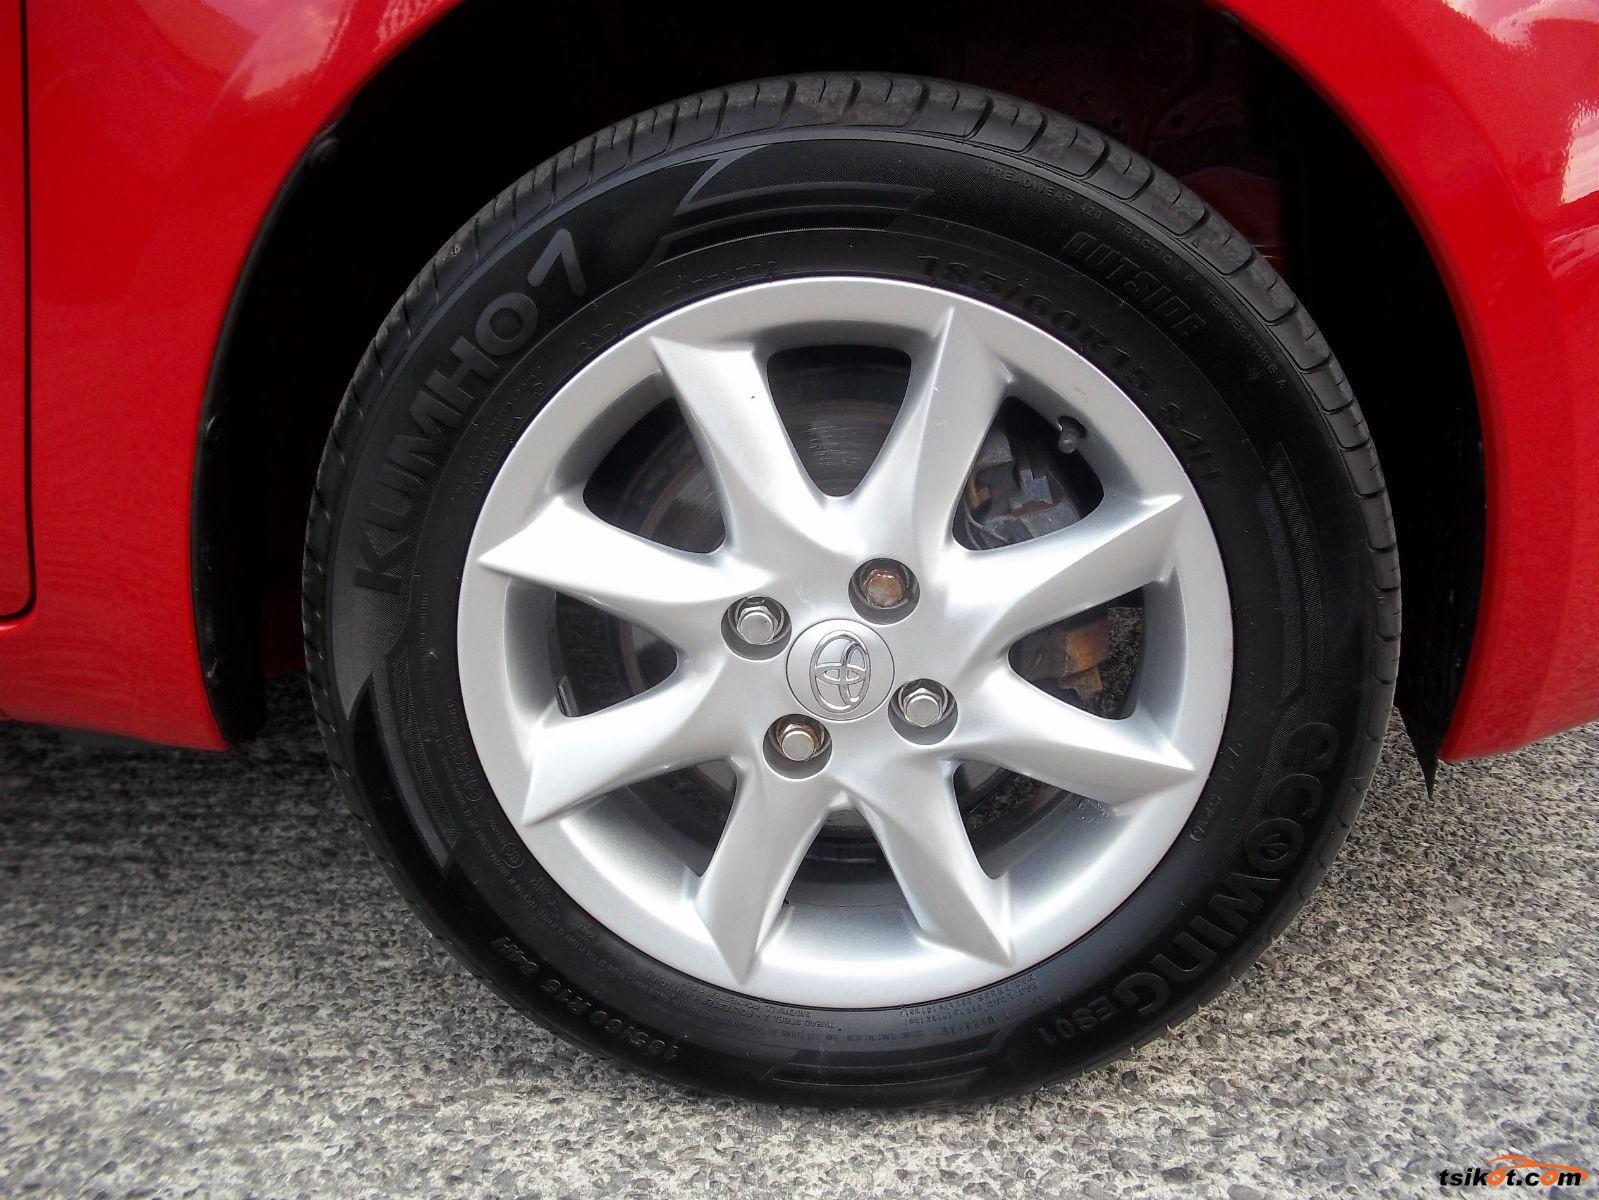 Toyota Yaris 2011 - 3